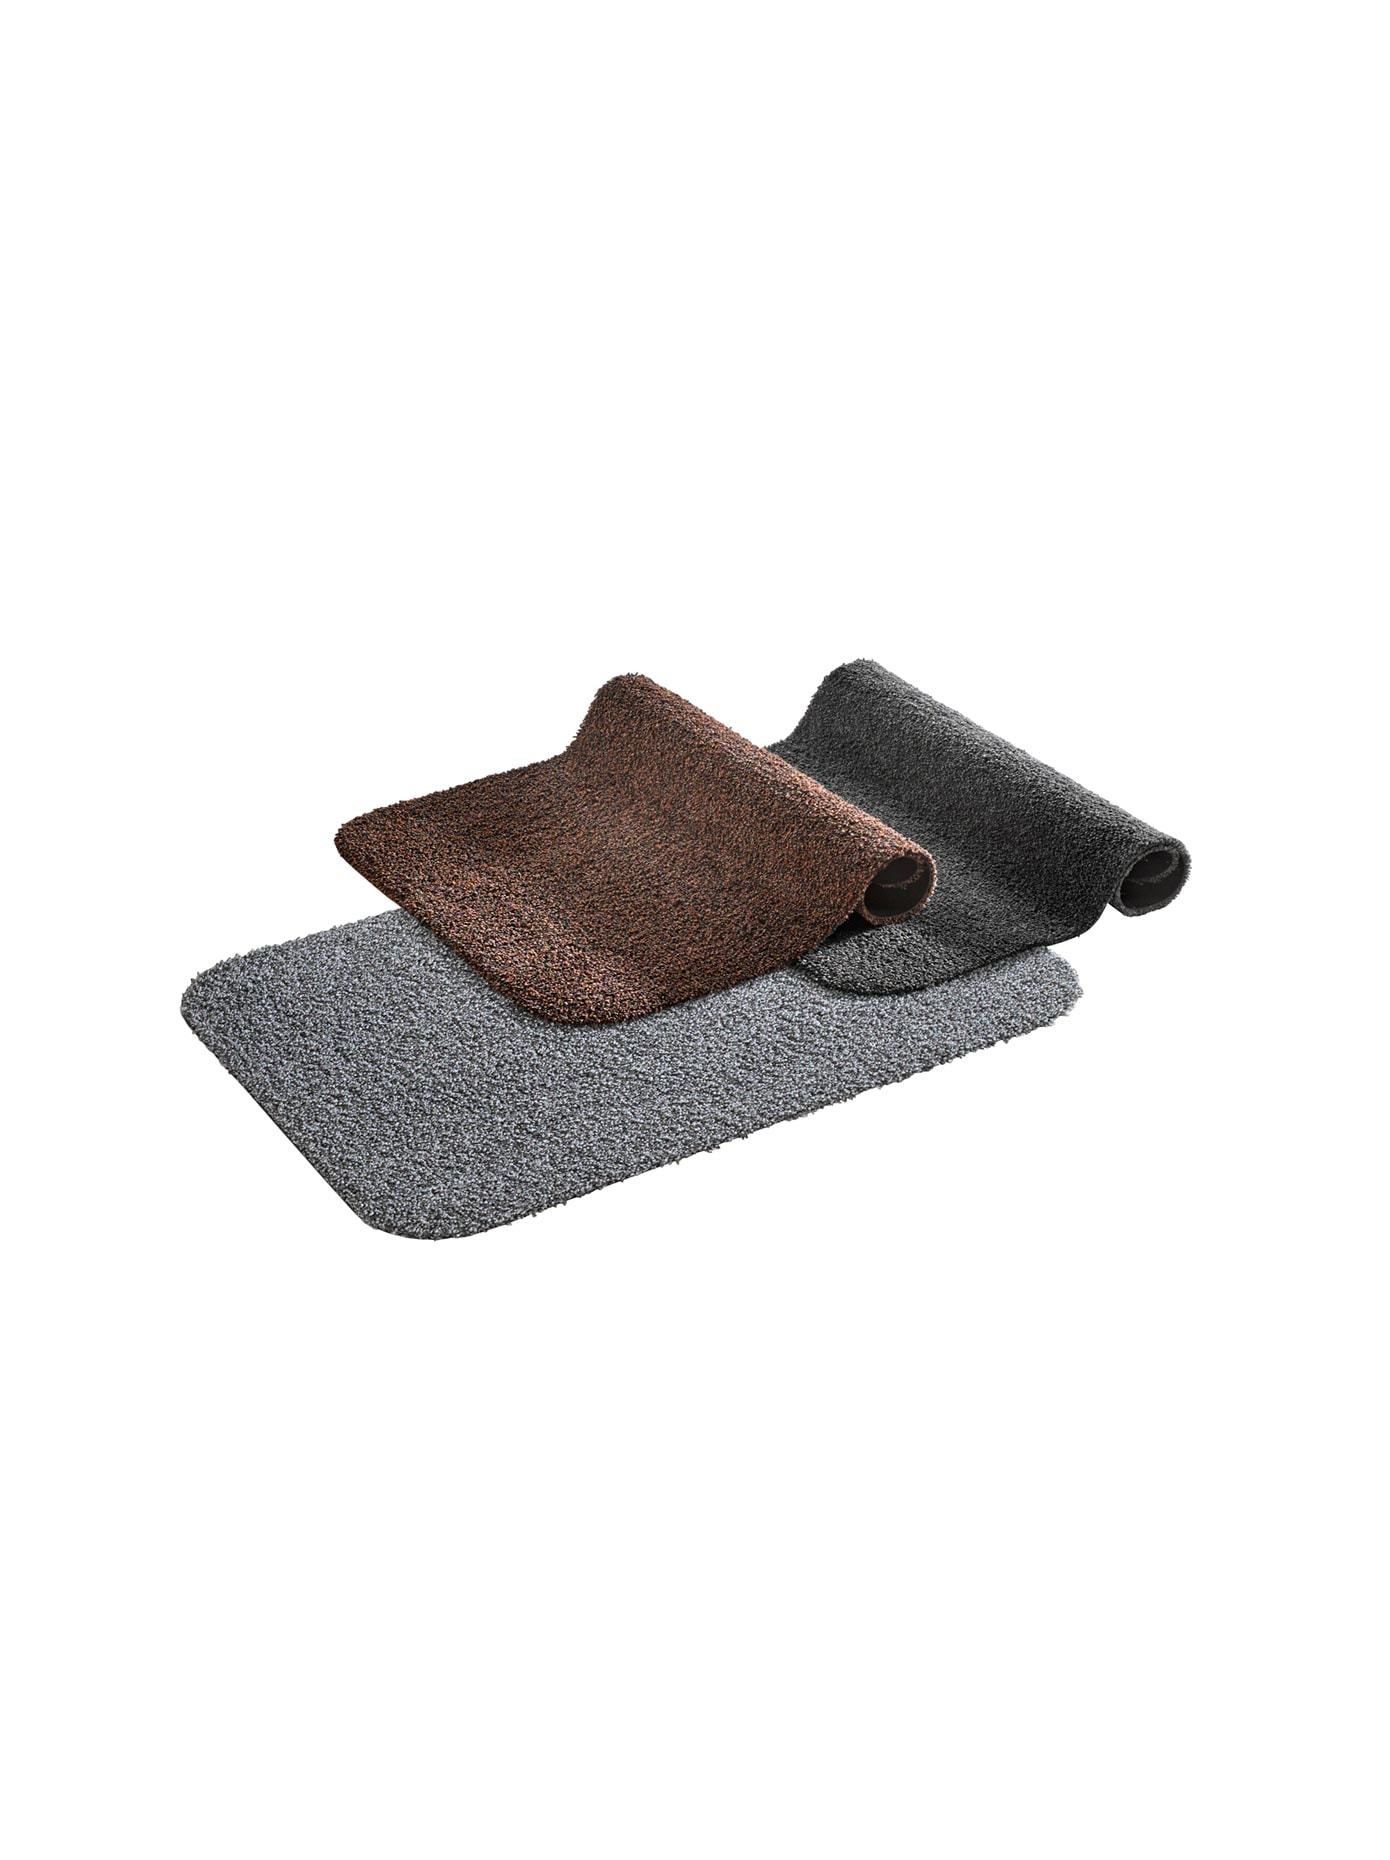 Schmutzfangmatte grau Diele Flur Teppiche, bunt